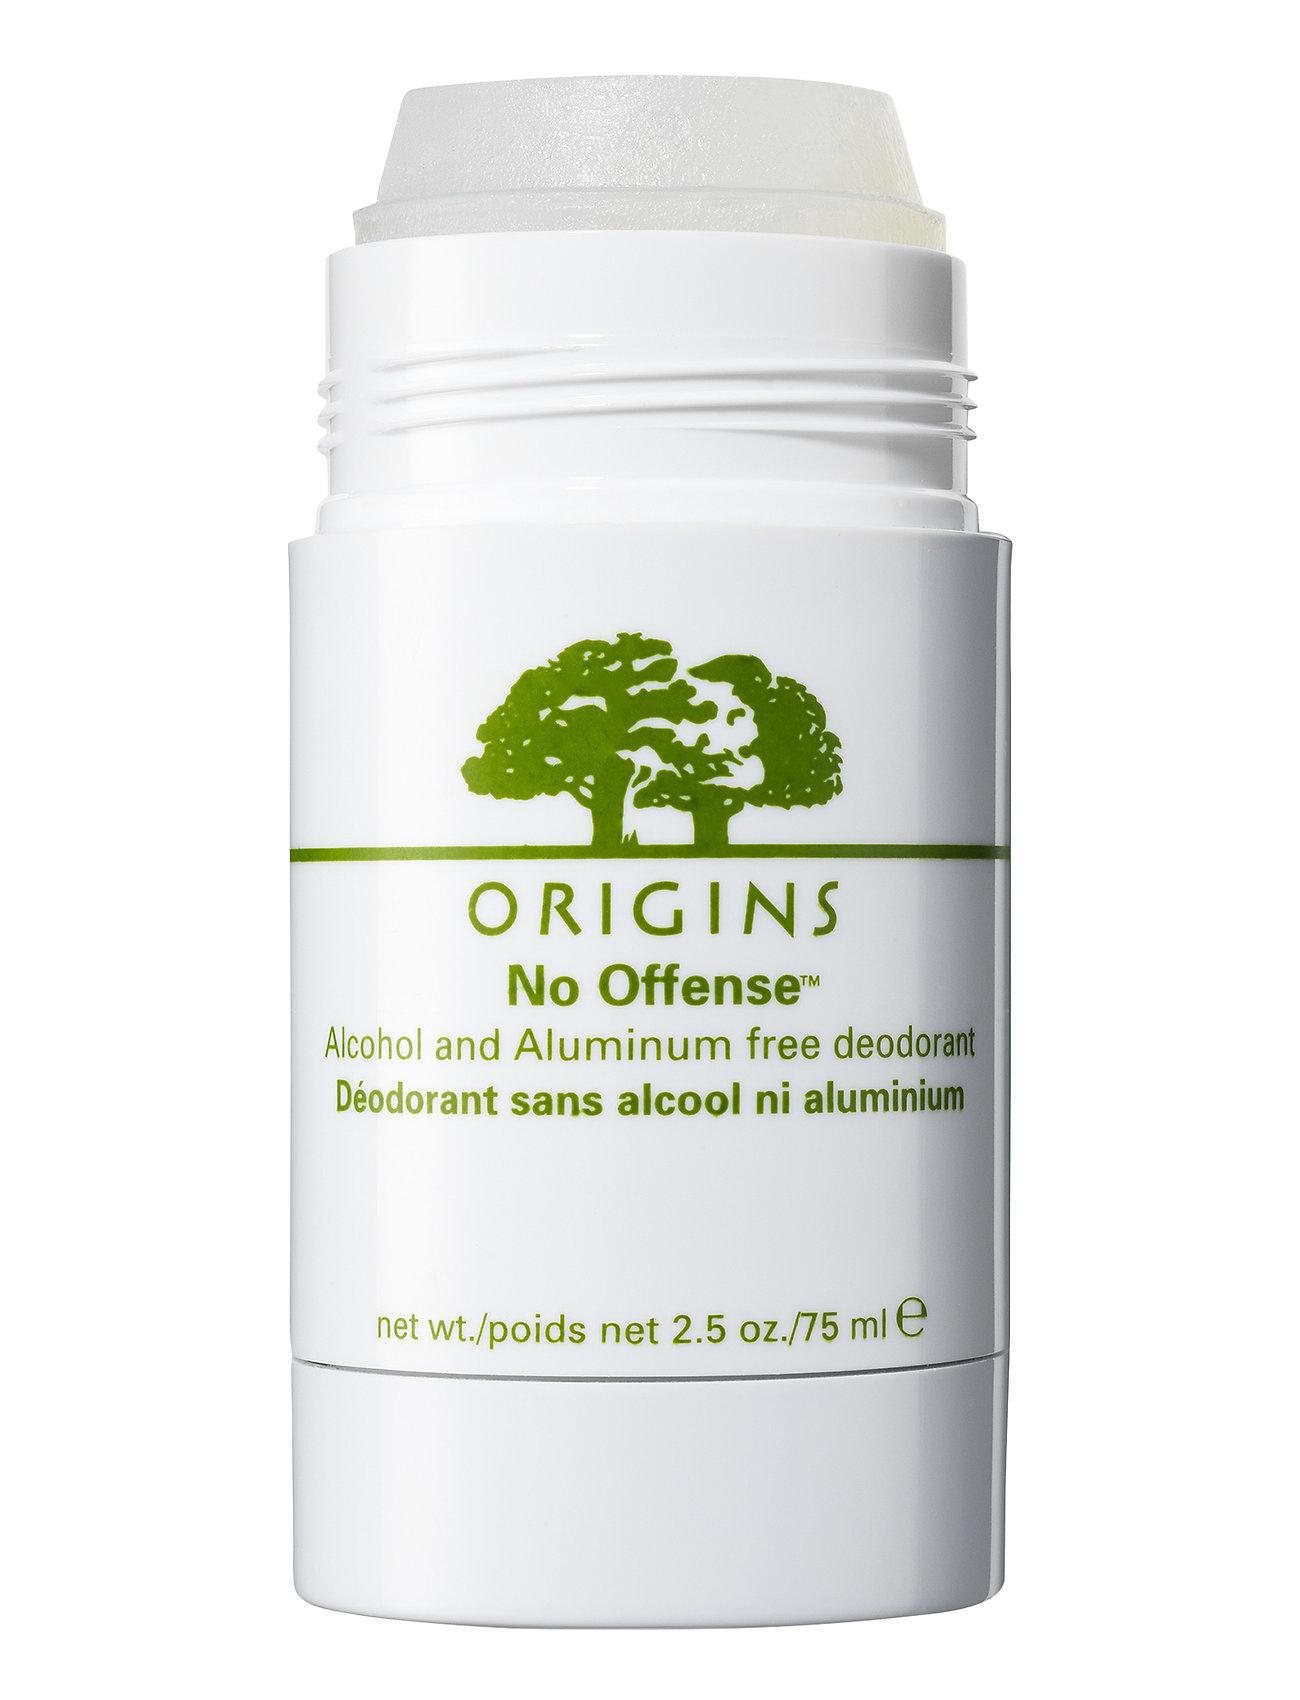 Image of No Offense™ Beauty MEN Deodorants Sticks Nude Origins (3254641901)